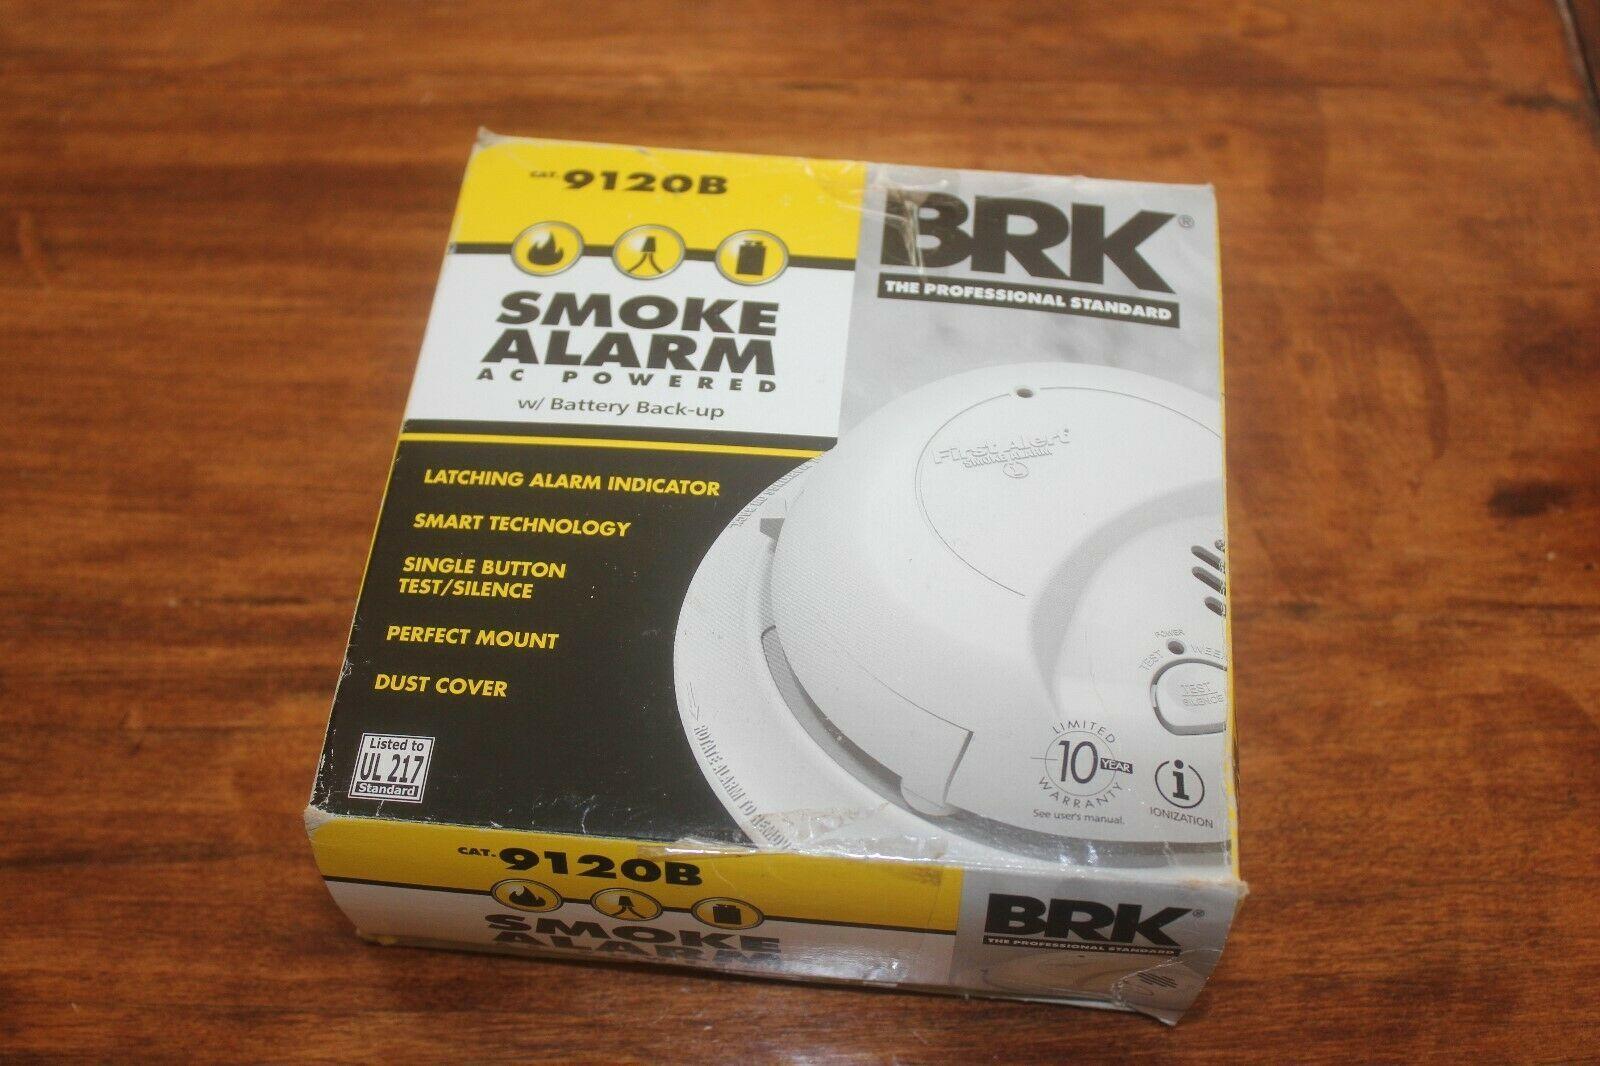 First Alert Brk Brands 9120b Hardwired Smoke Alarm With Battery Backup Single Battery Backup Smoke Alarms Alarm